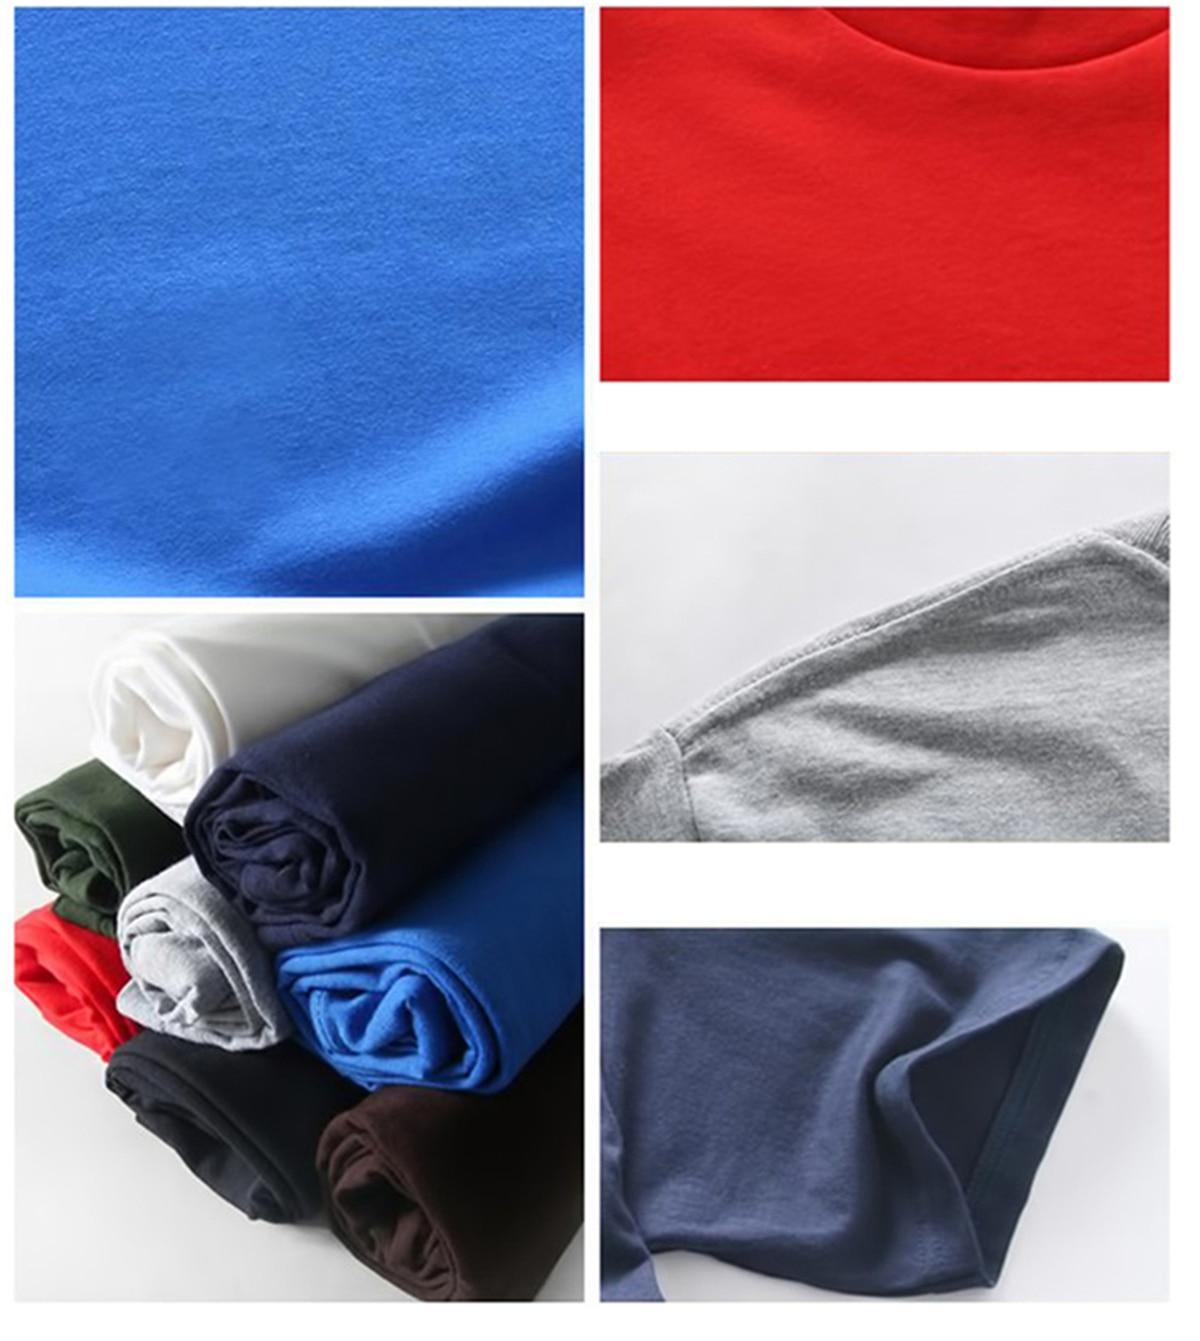 GILDAN Cute Narwhal T-Shirt - Pocket Narwhal Shirt Dress female T-shirt